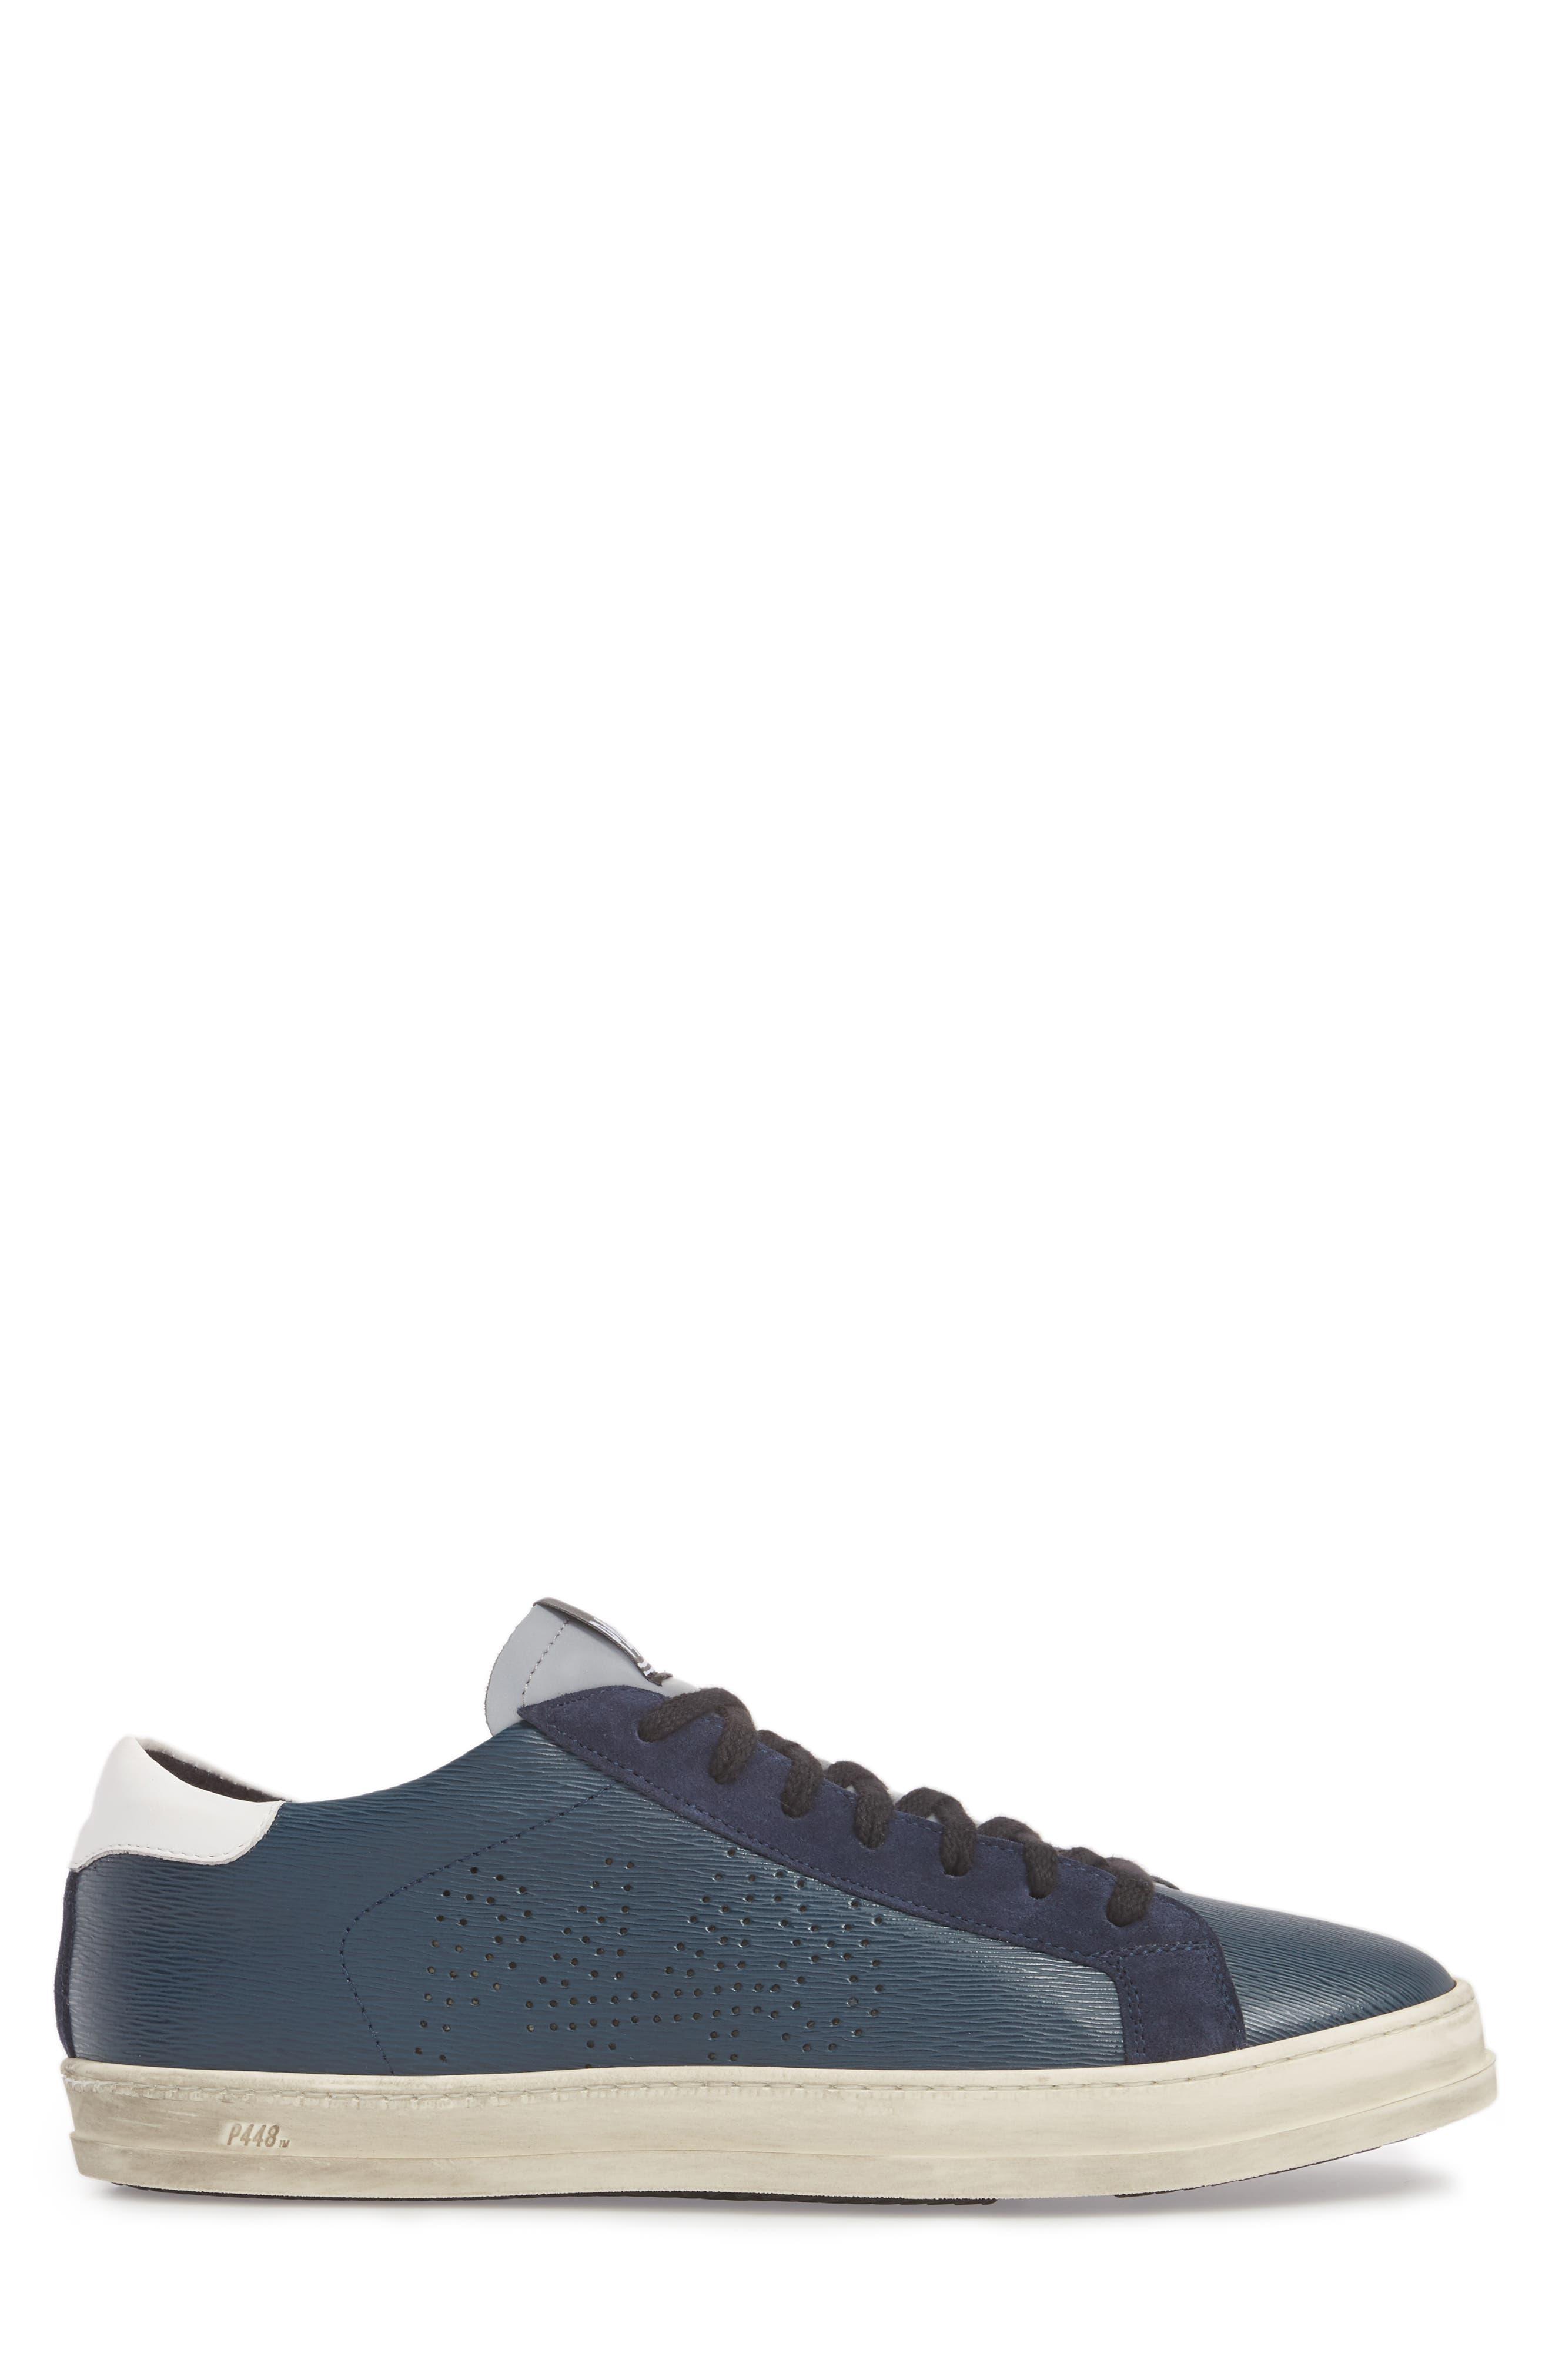 John Low Top Sneaker,                             Alternate thumbnail 3, color,                             Navy